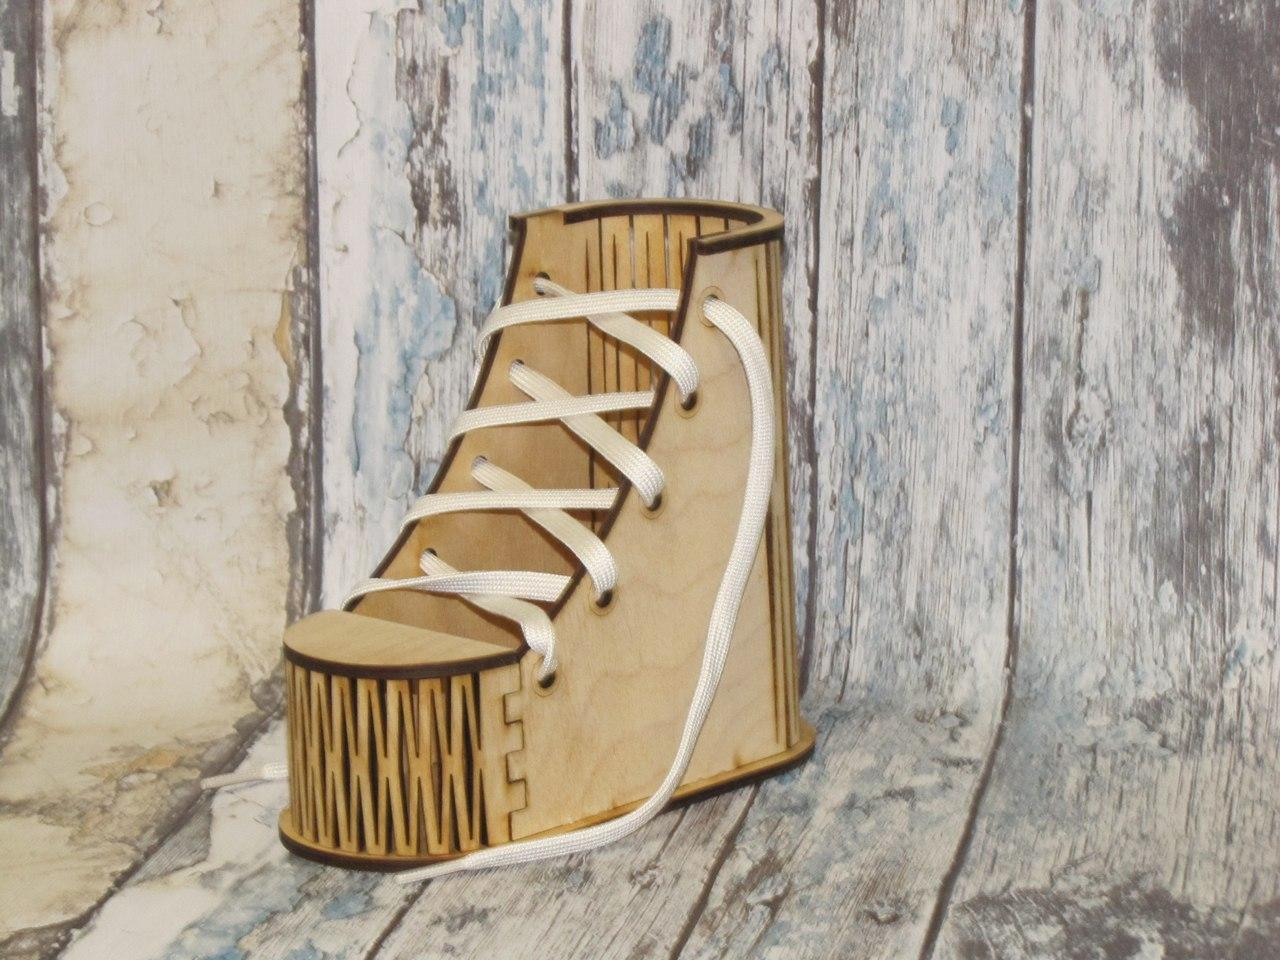 Laser Cut Wooden Shape Shoes Stand Desk Organizer Pen Pencil Holder Free Vector